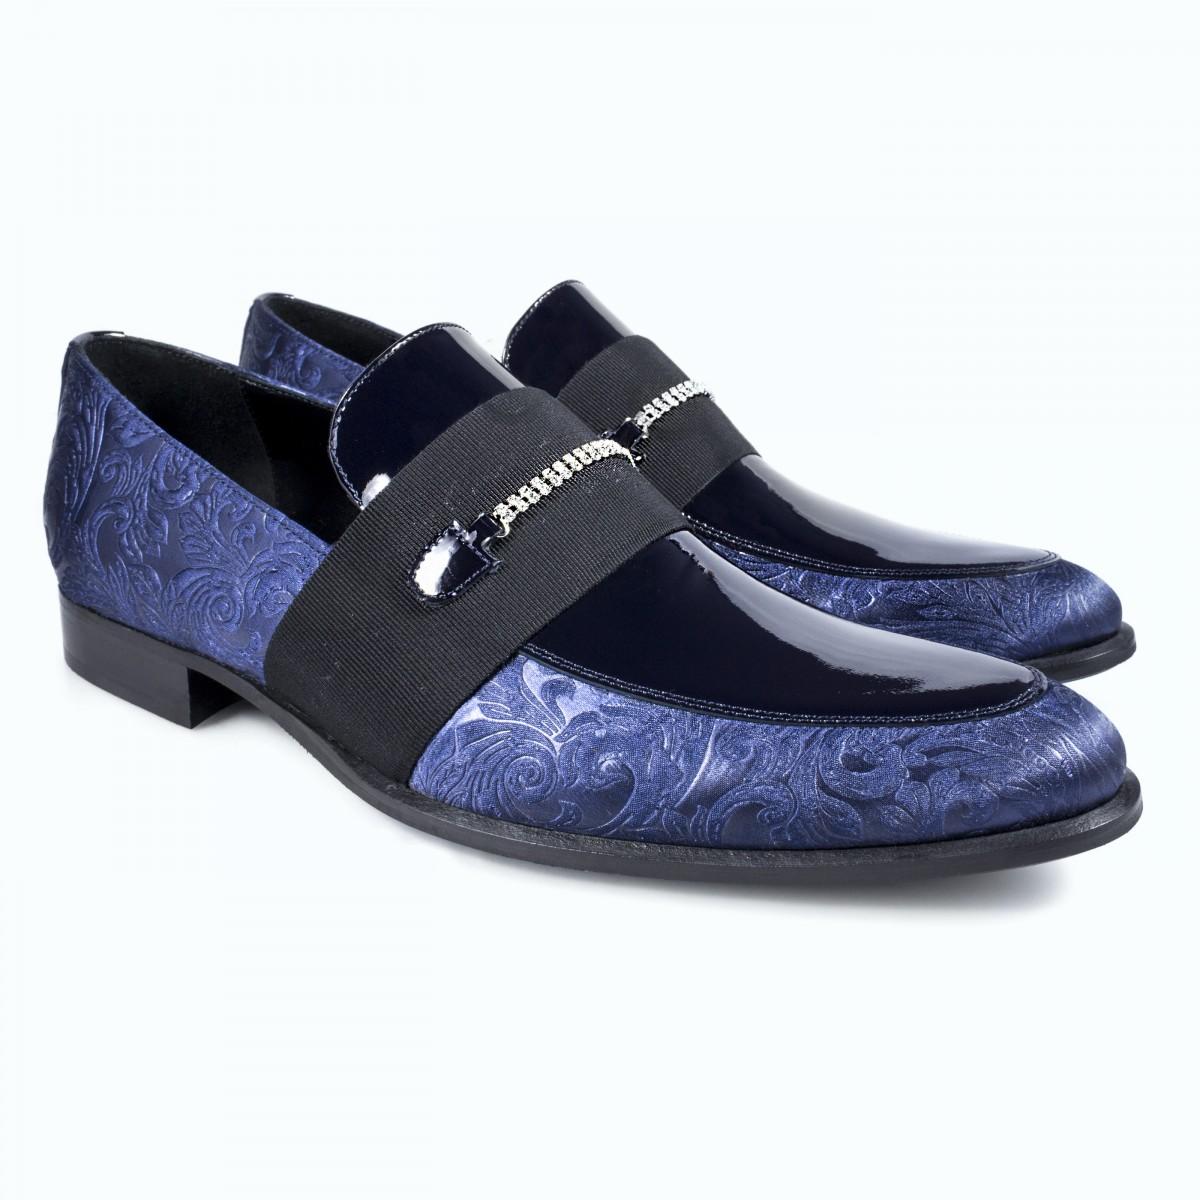 Mocassino Uomo Matrimonio : Scarpe eleganti da uomo mocassino blu per cerimonia